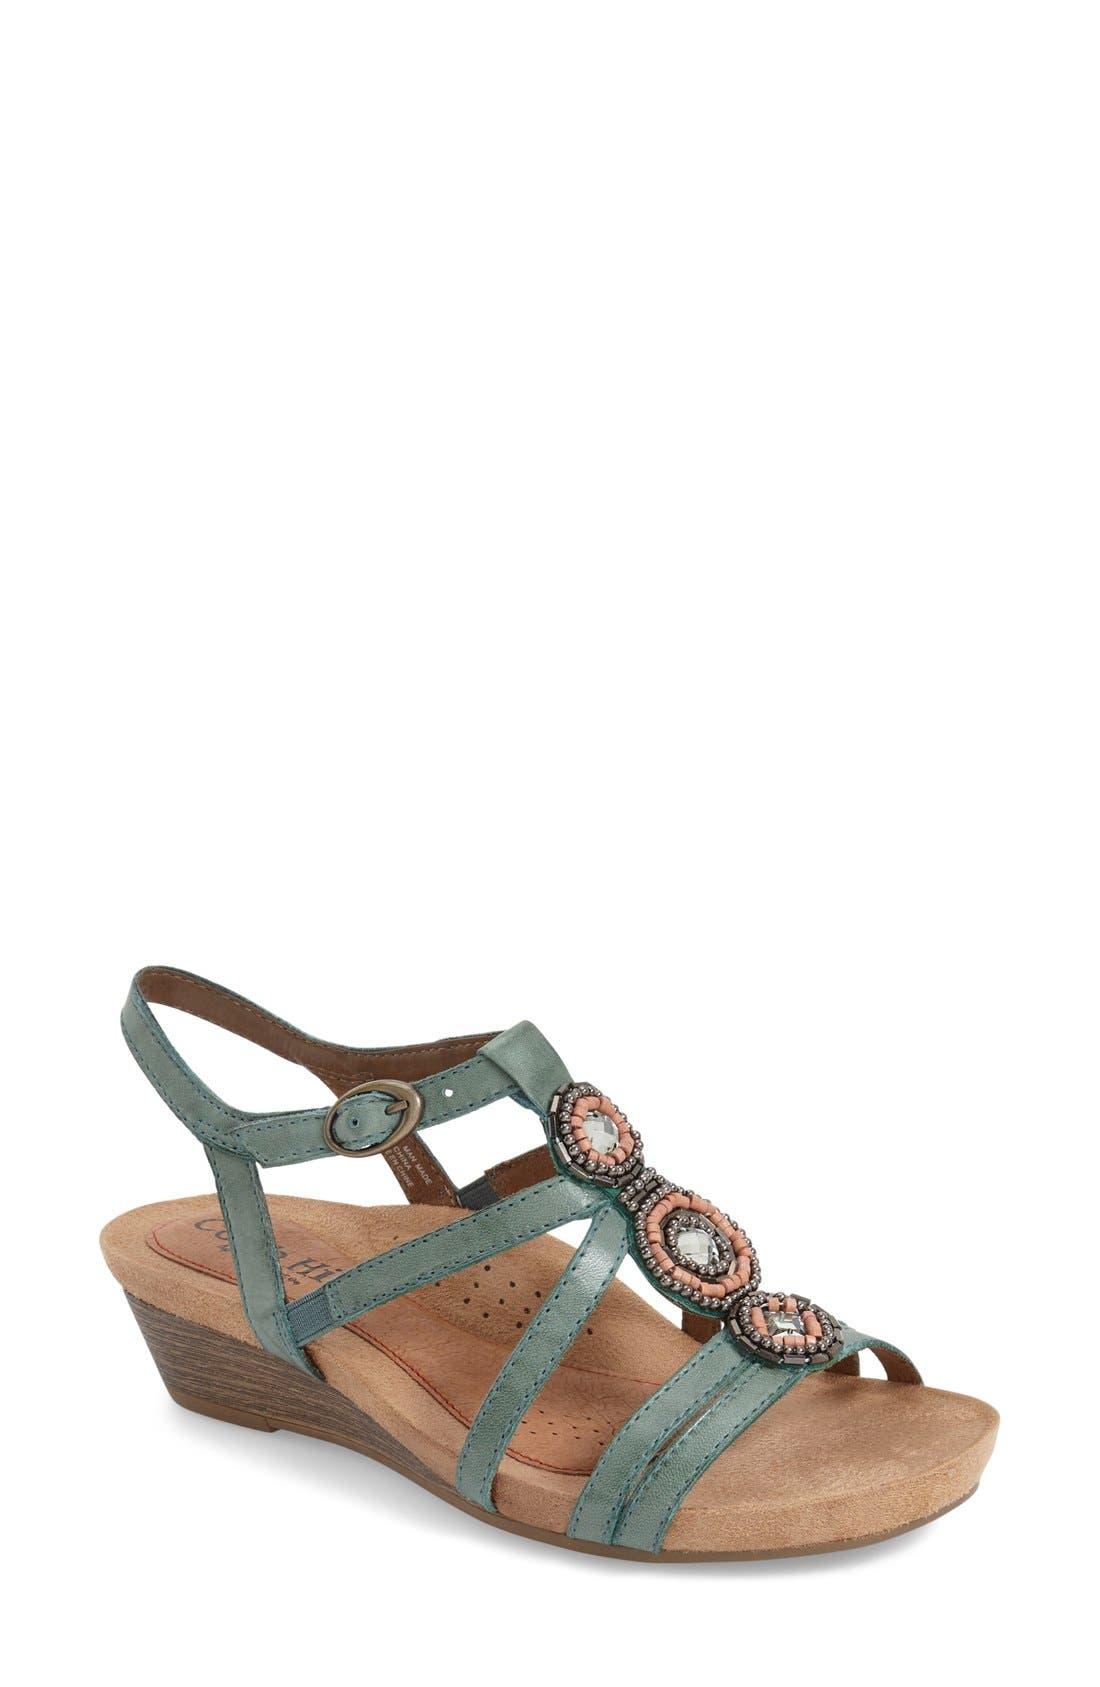 'Hannah' Leather Sandal,                         Main,                         color, Teal Leather